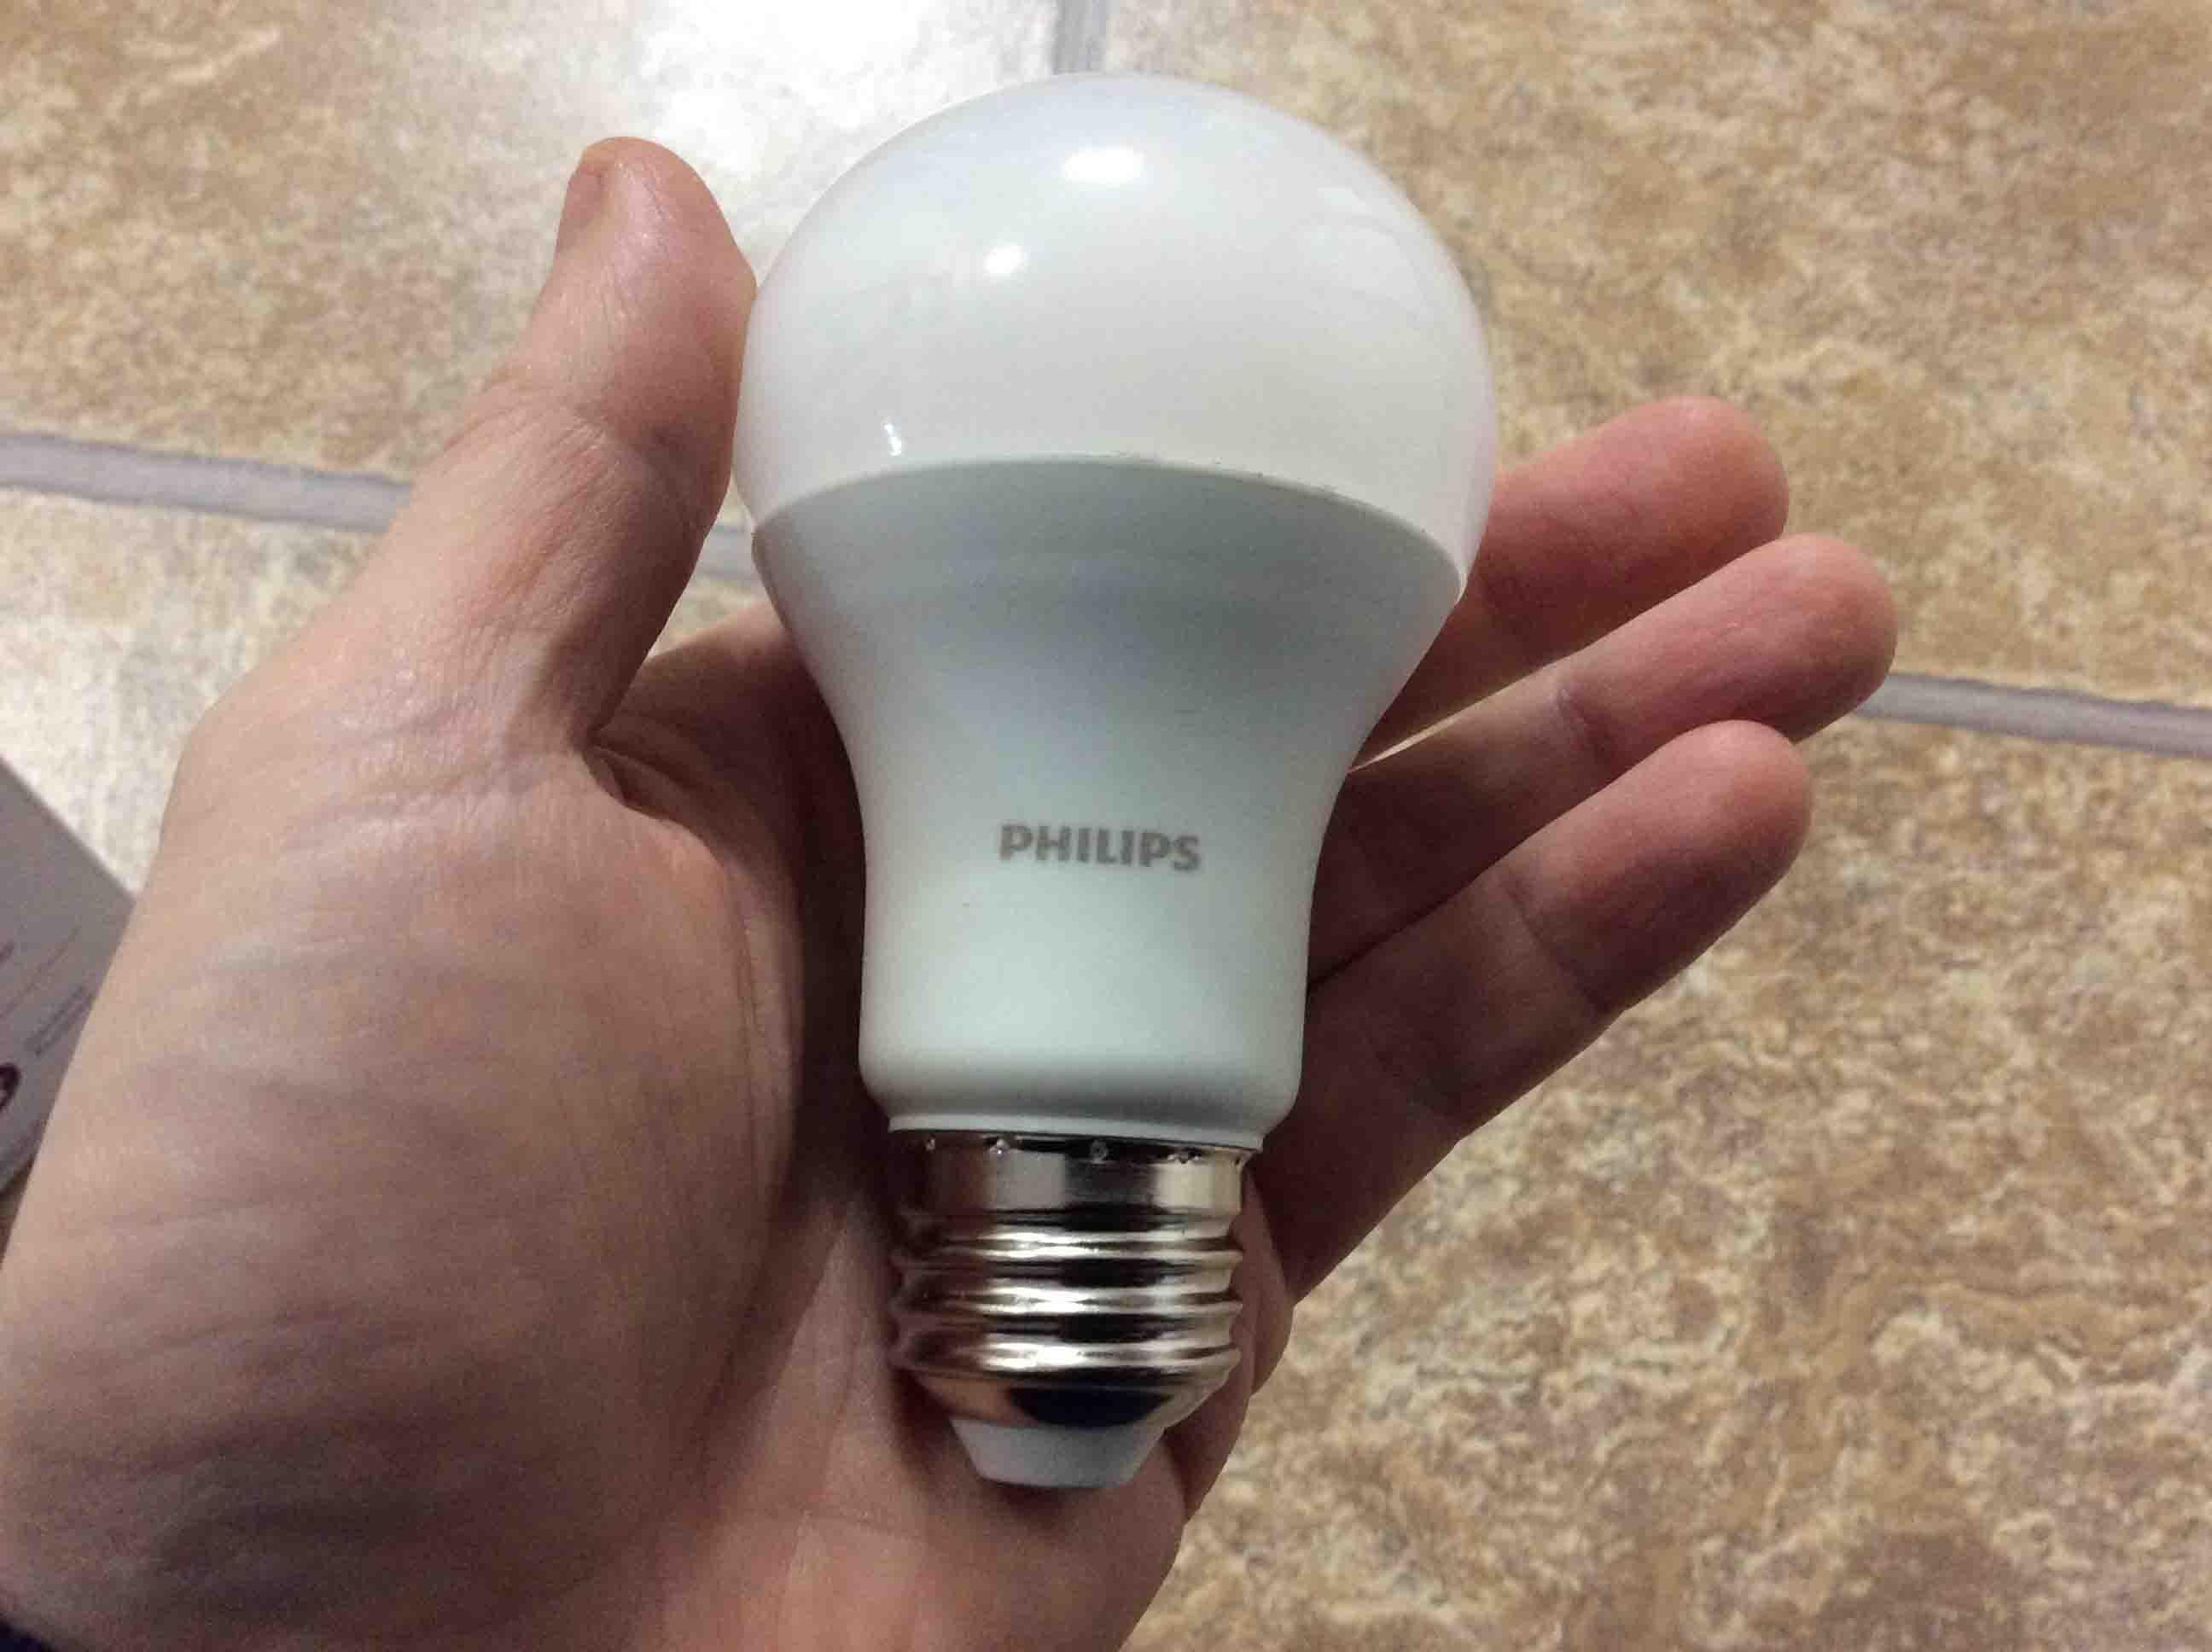 PhilipsLED75wA19DaylightWhiteLightBulbHeldInHand_001 Wunderschöne Led Lampen 100 Watt Dekorationen